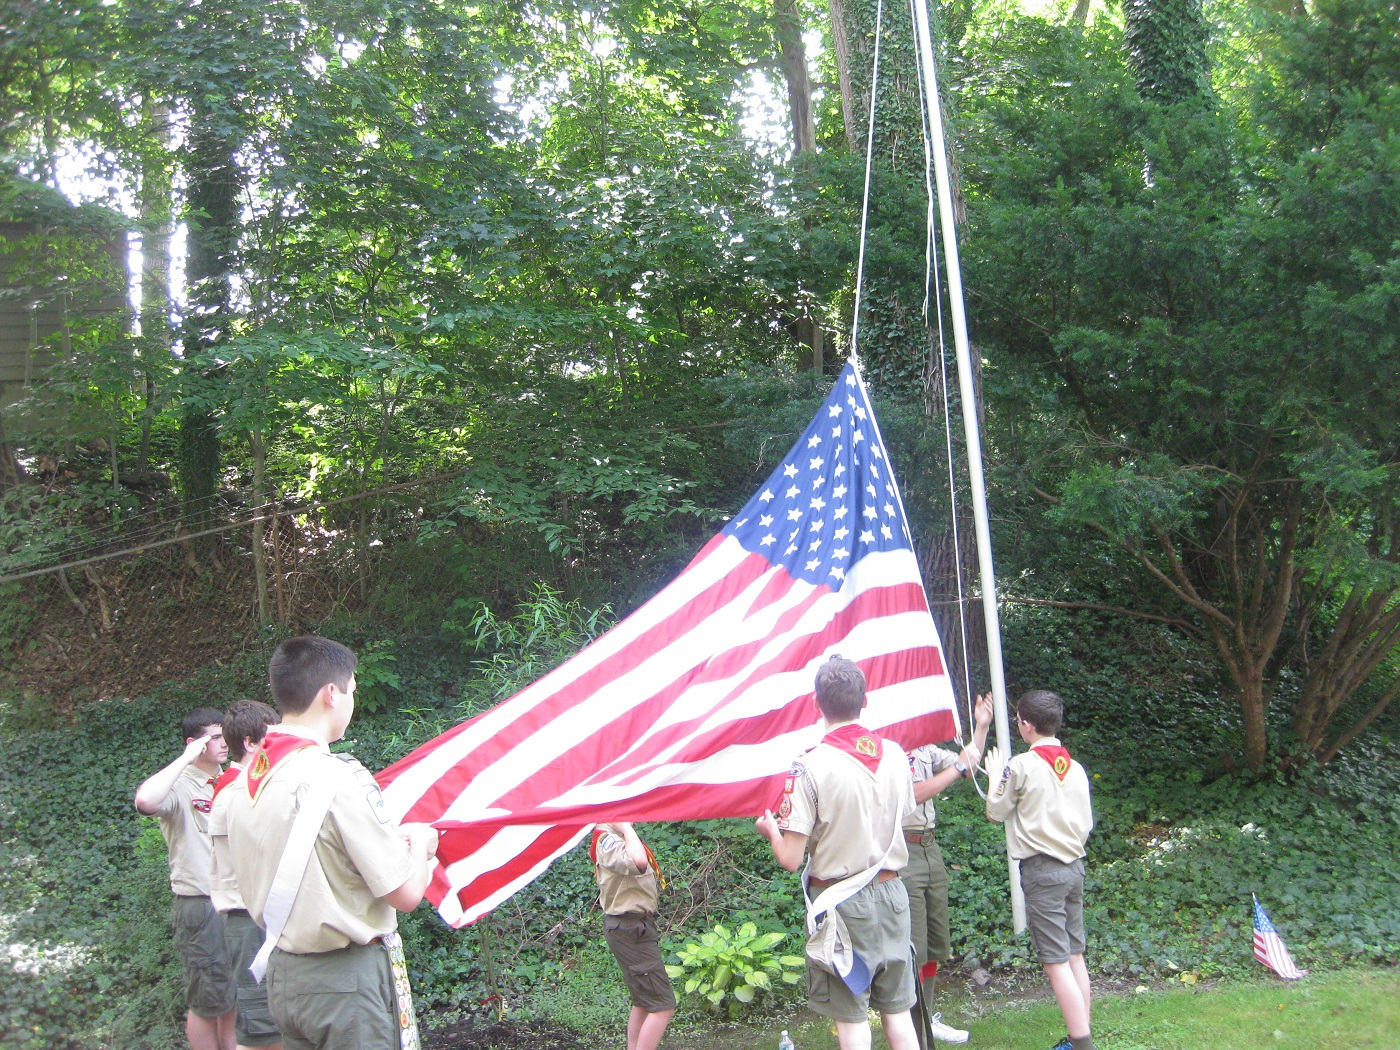 scouts raising flag.jpg